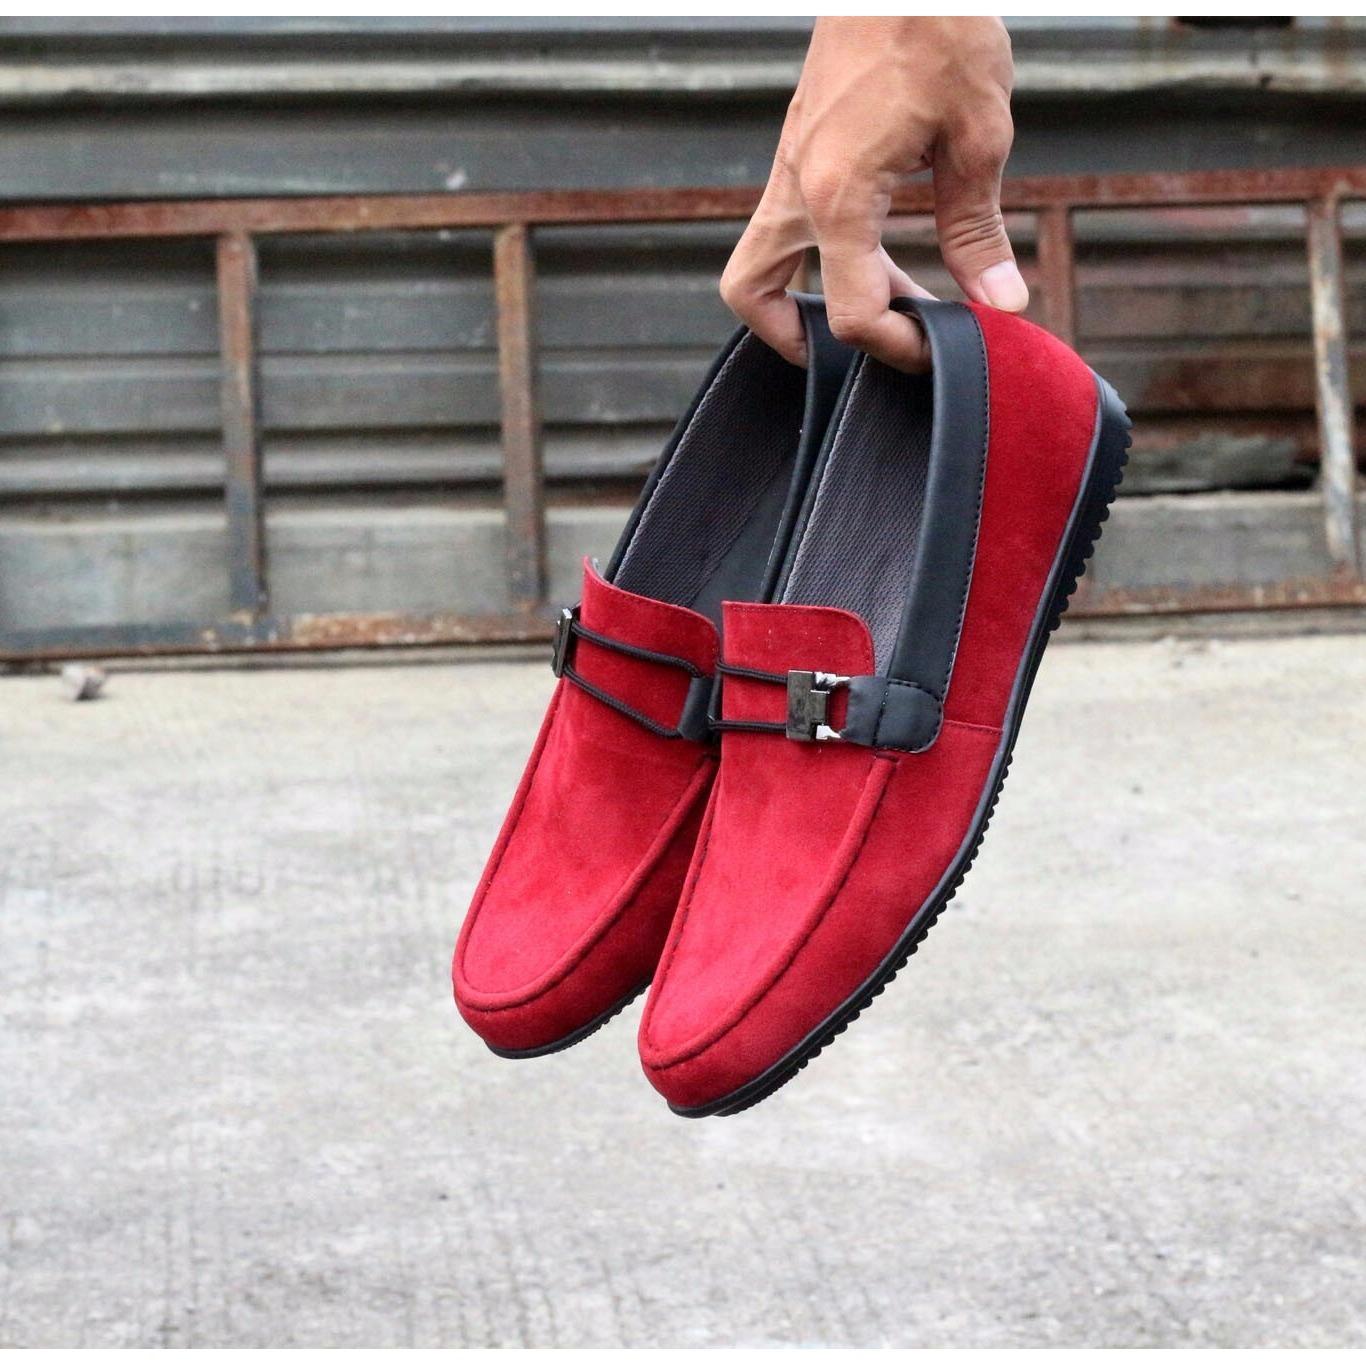 Berapa Harga Kerak Store Sepatu Casual Slip On Loafer Pria B A E Weah Di Jawa Barat